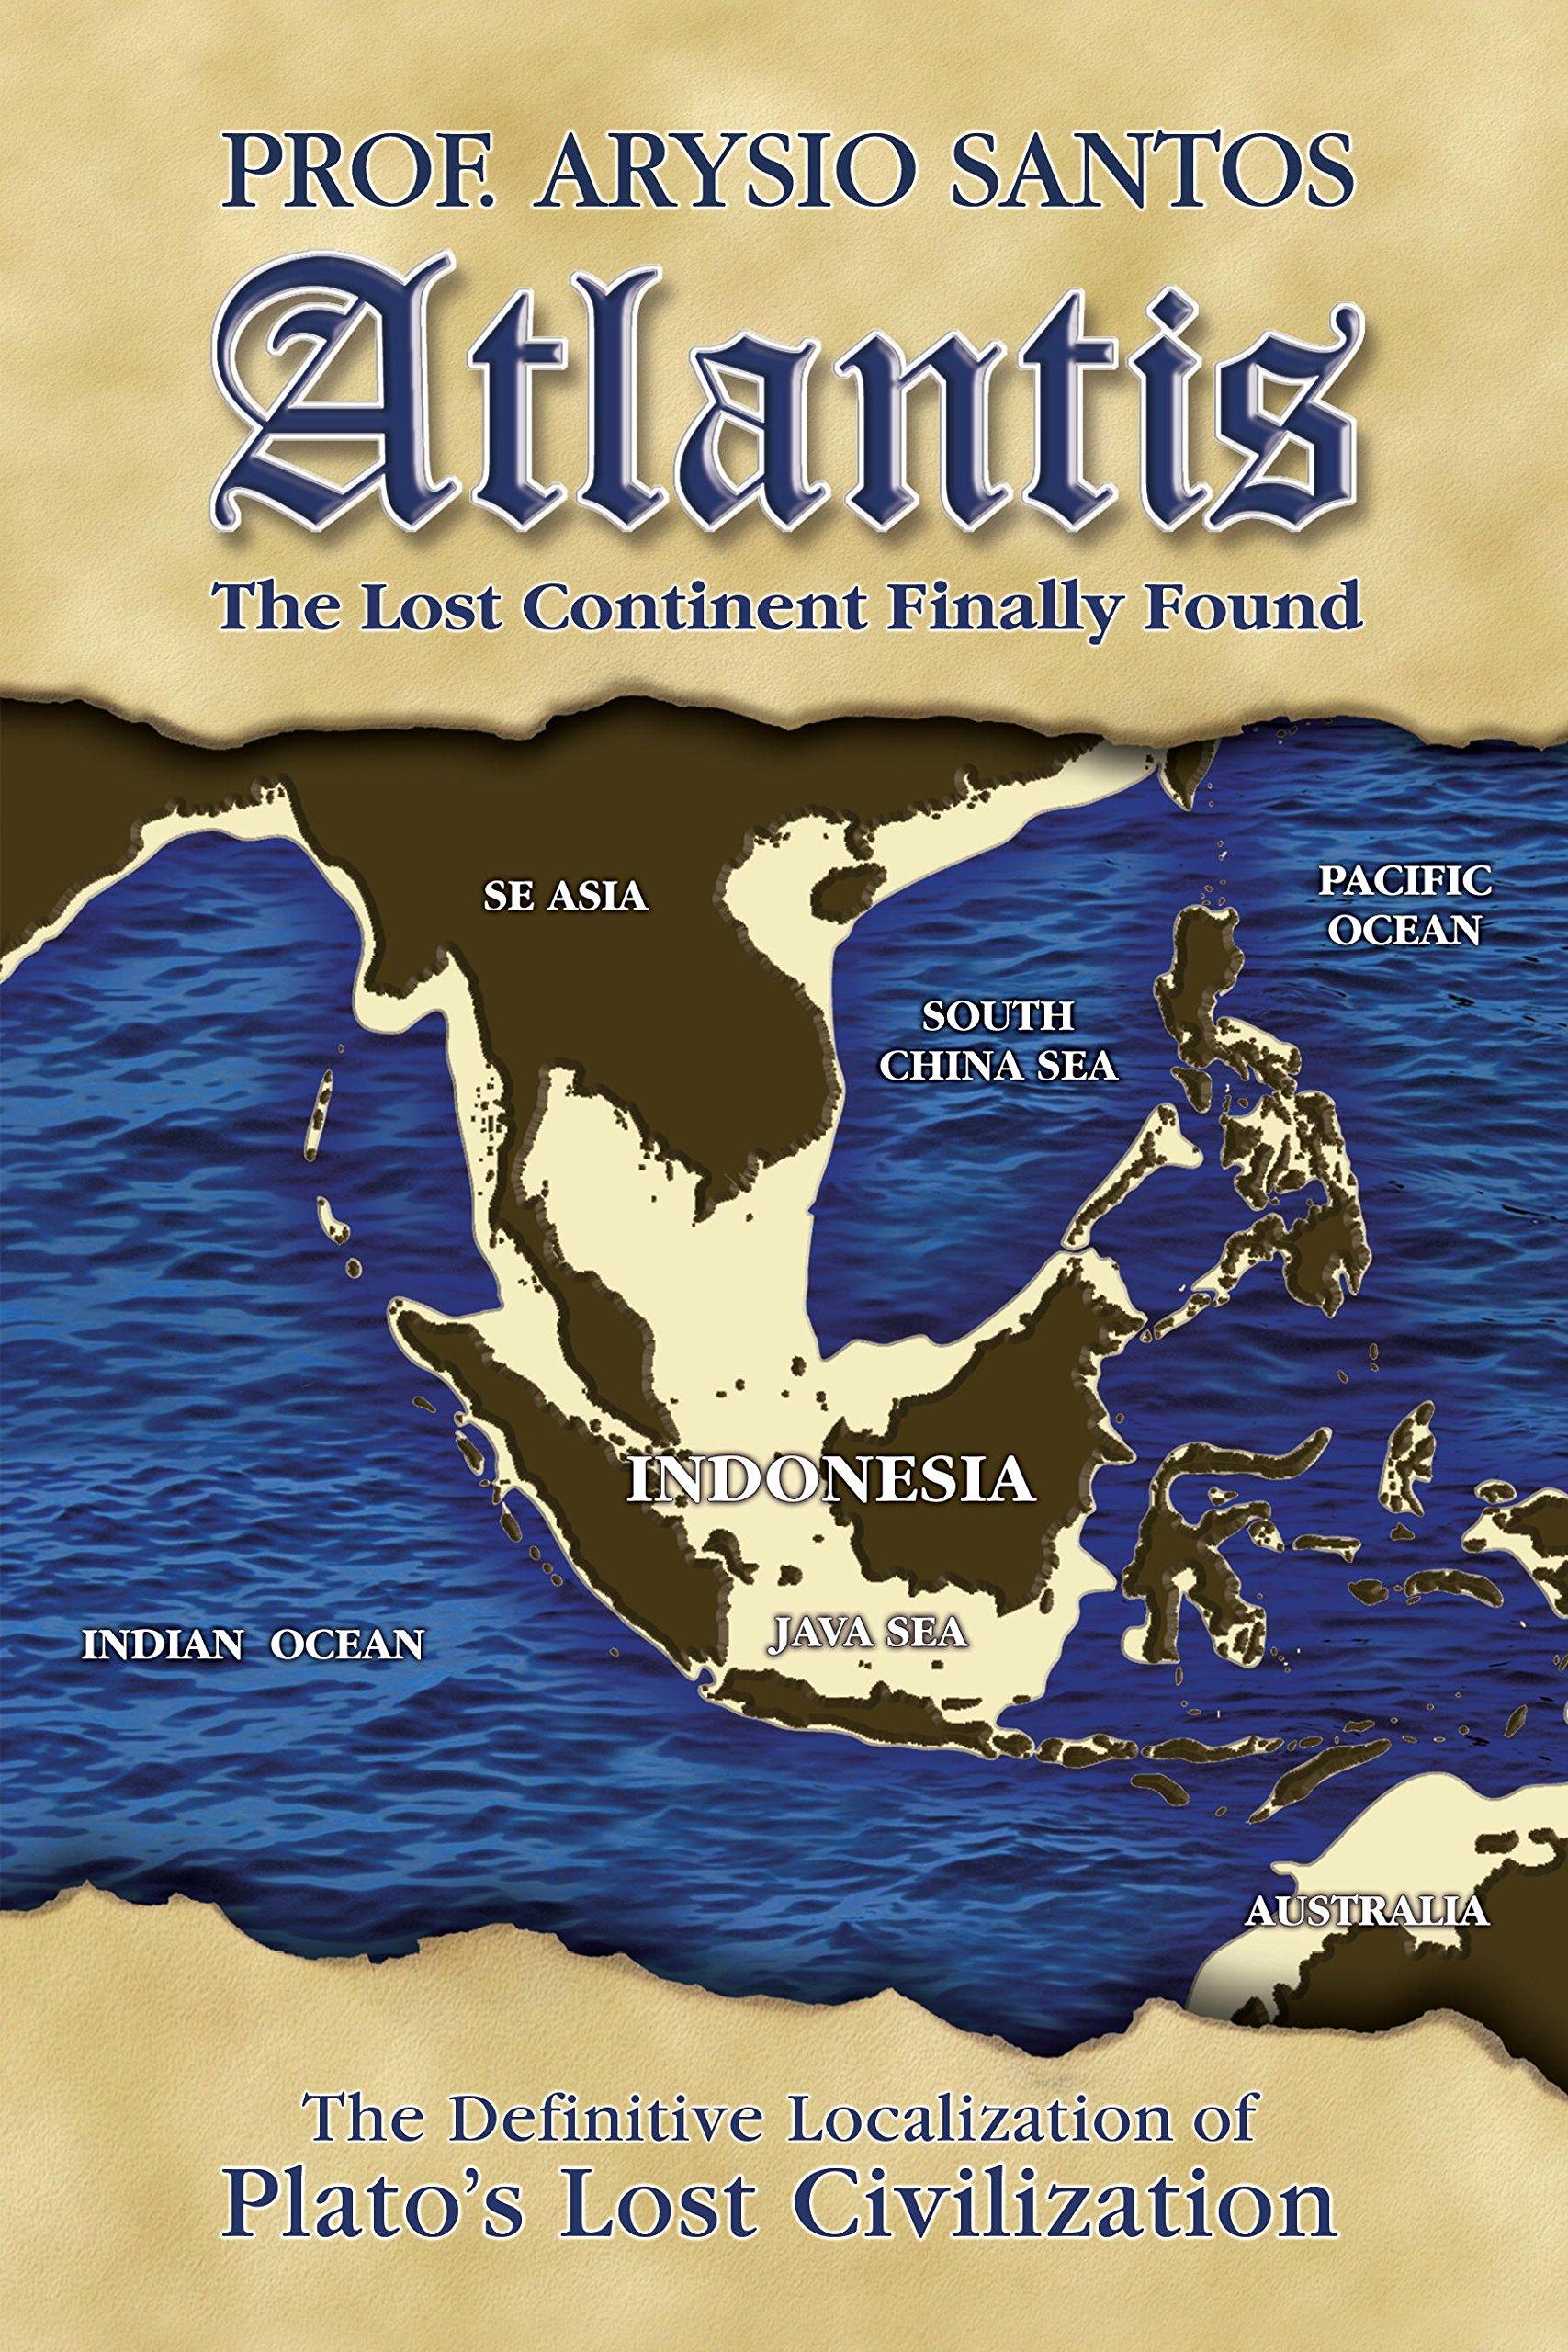 Amazon atlantis the lost continent finally found amazon atlantis the lost continent finally found 9781556439568 arysio santos books sciox Gallery